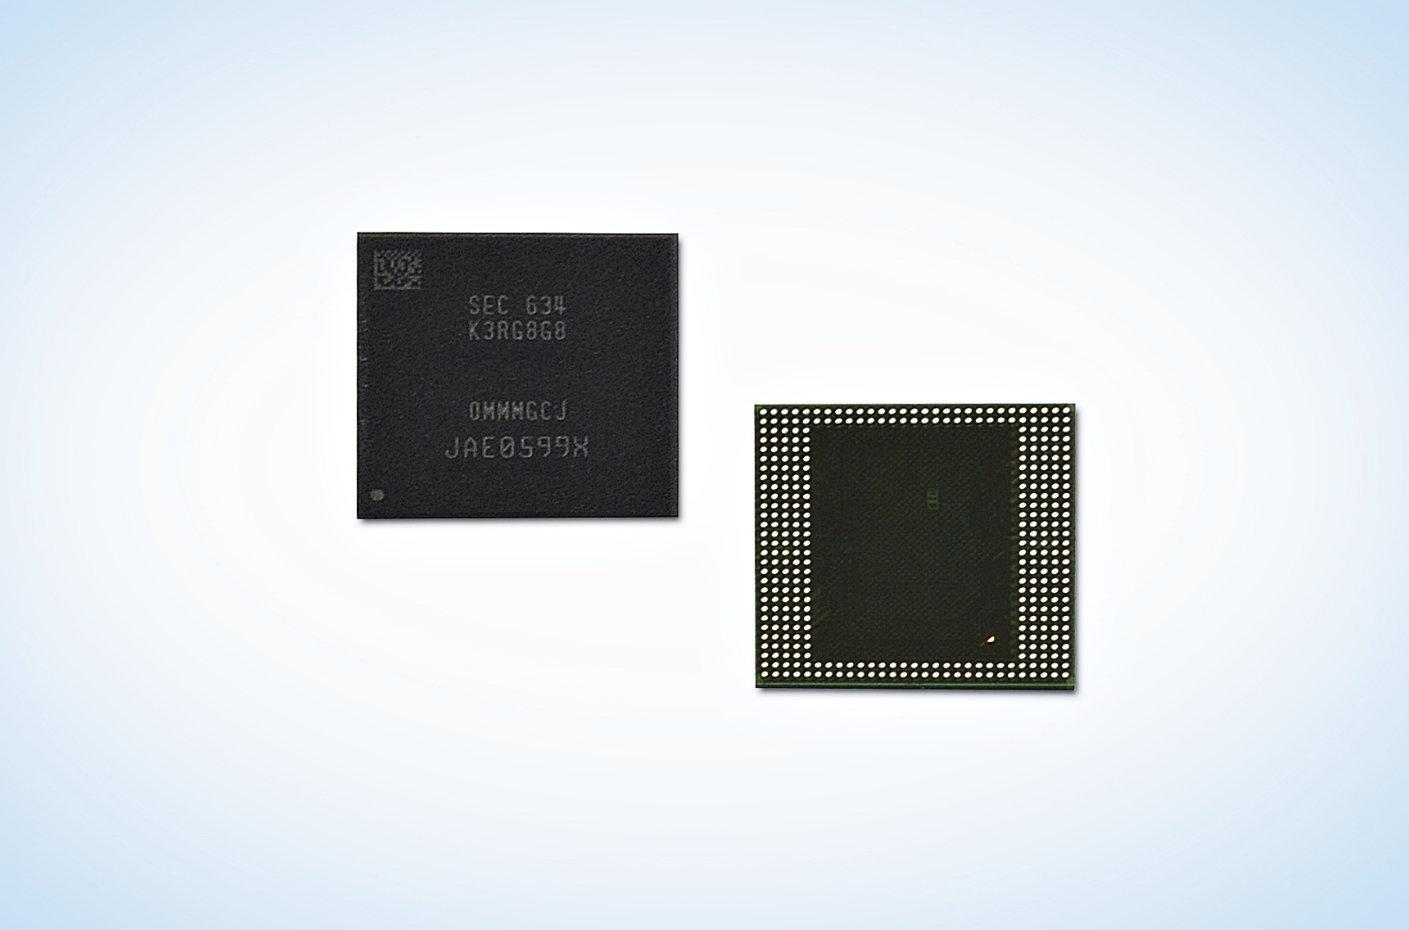 8 GByte LPDDR4 DRAM